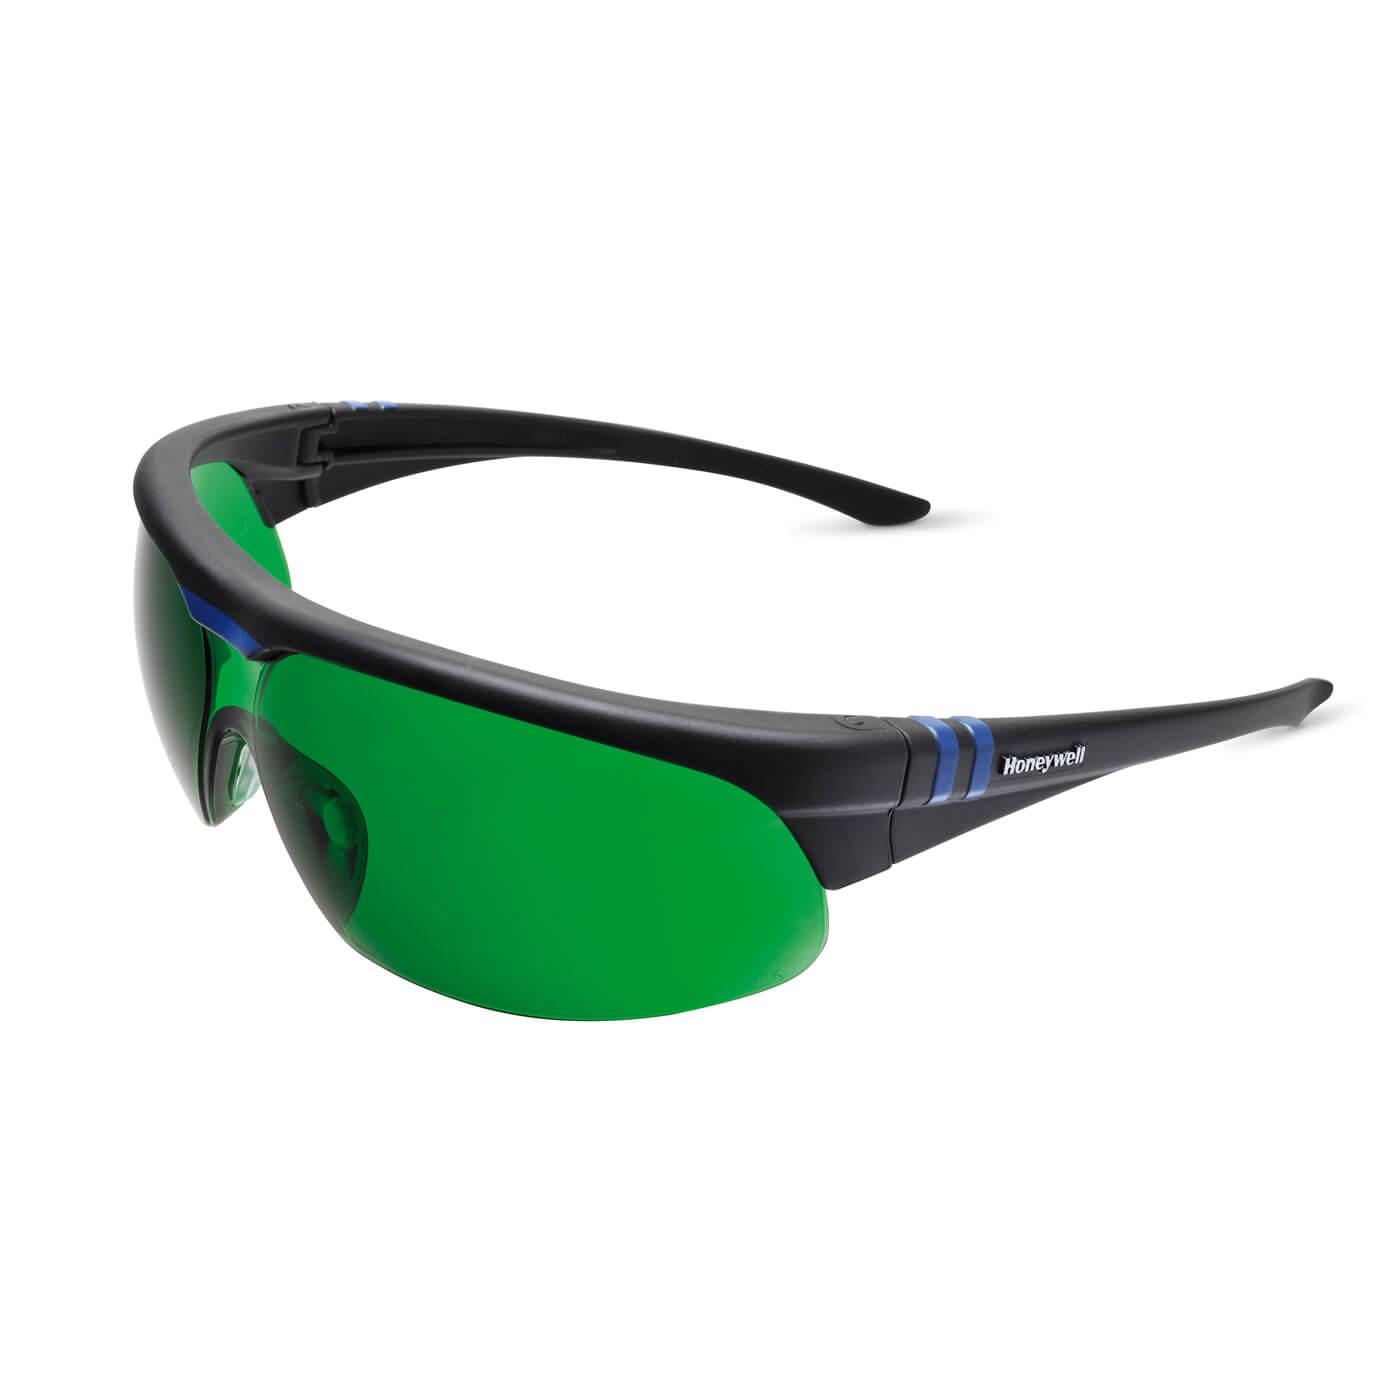 Okulary ochronne Millennia 2G 1032183 Honeywell zielona soczewka